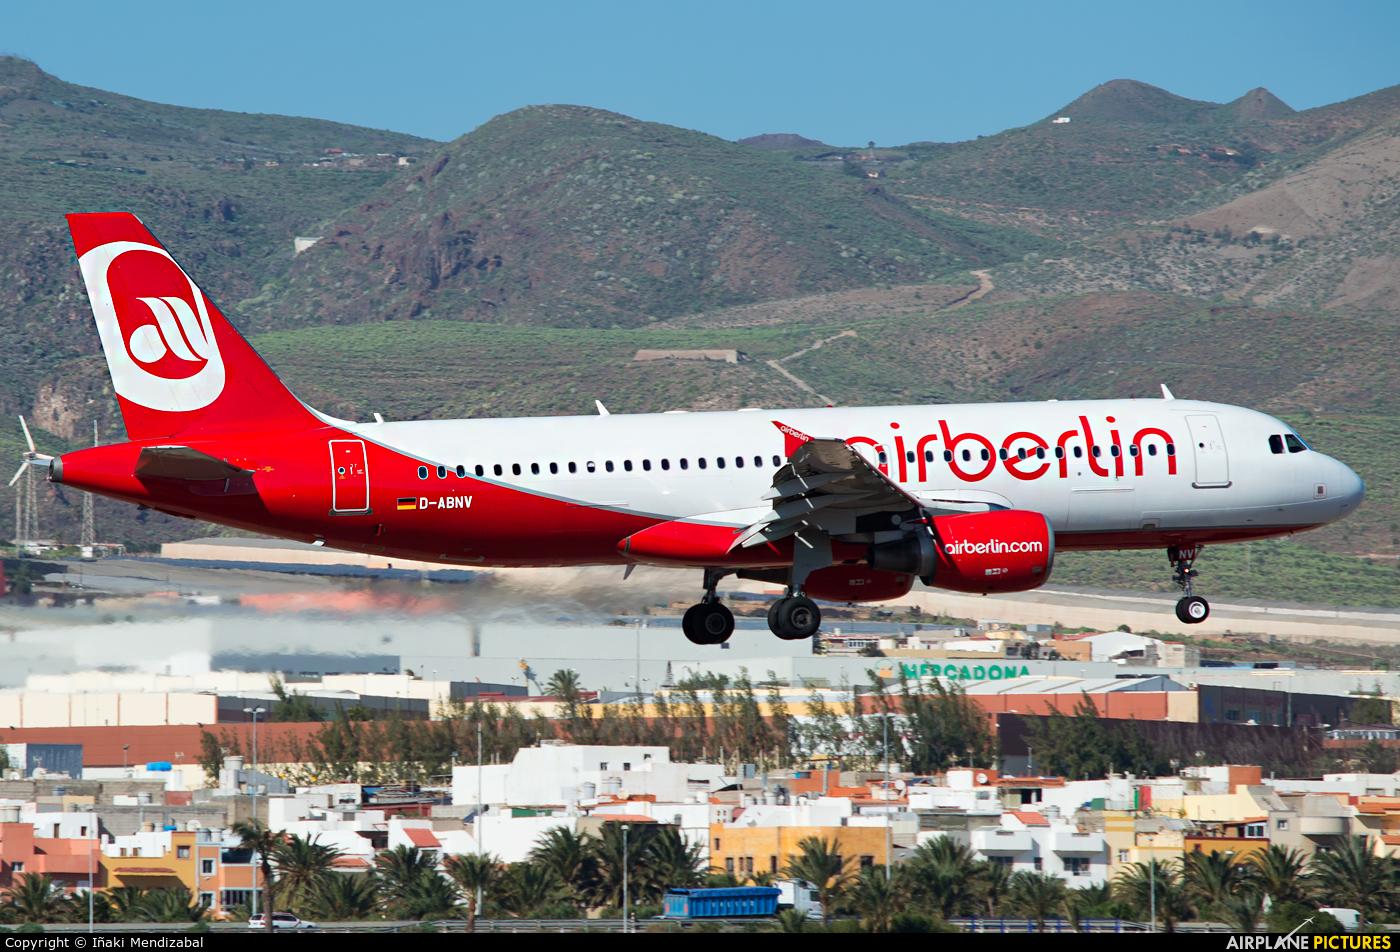 Air Berlin D-ABNV aircraft at Las Palmas de Gran Canaria